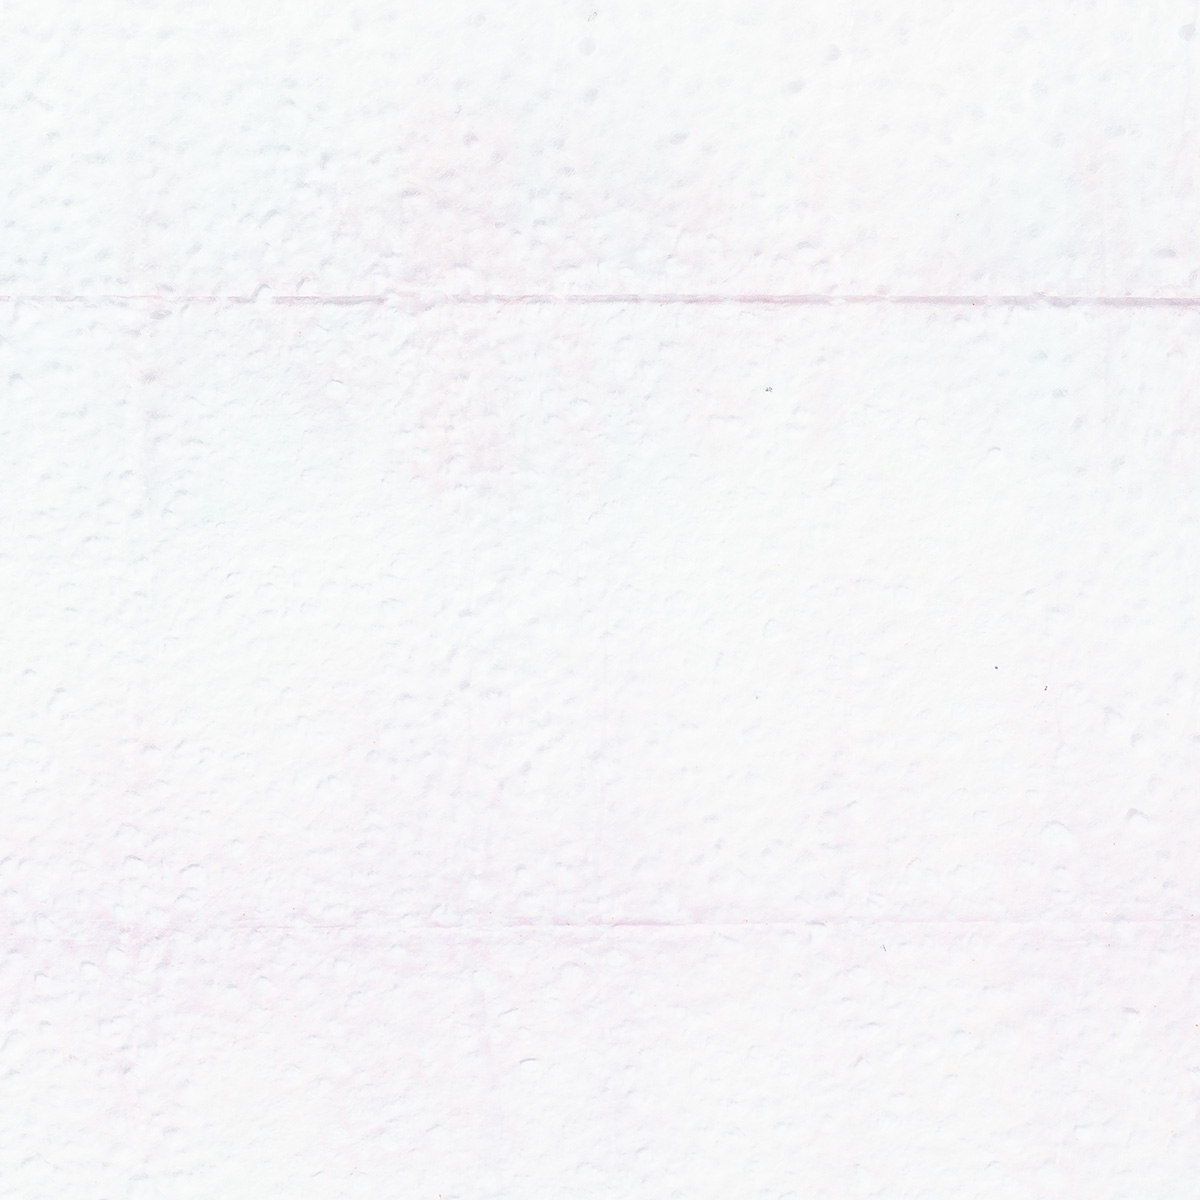 落水紙(春雨)板締め No.8